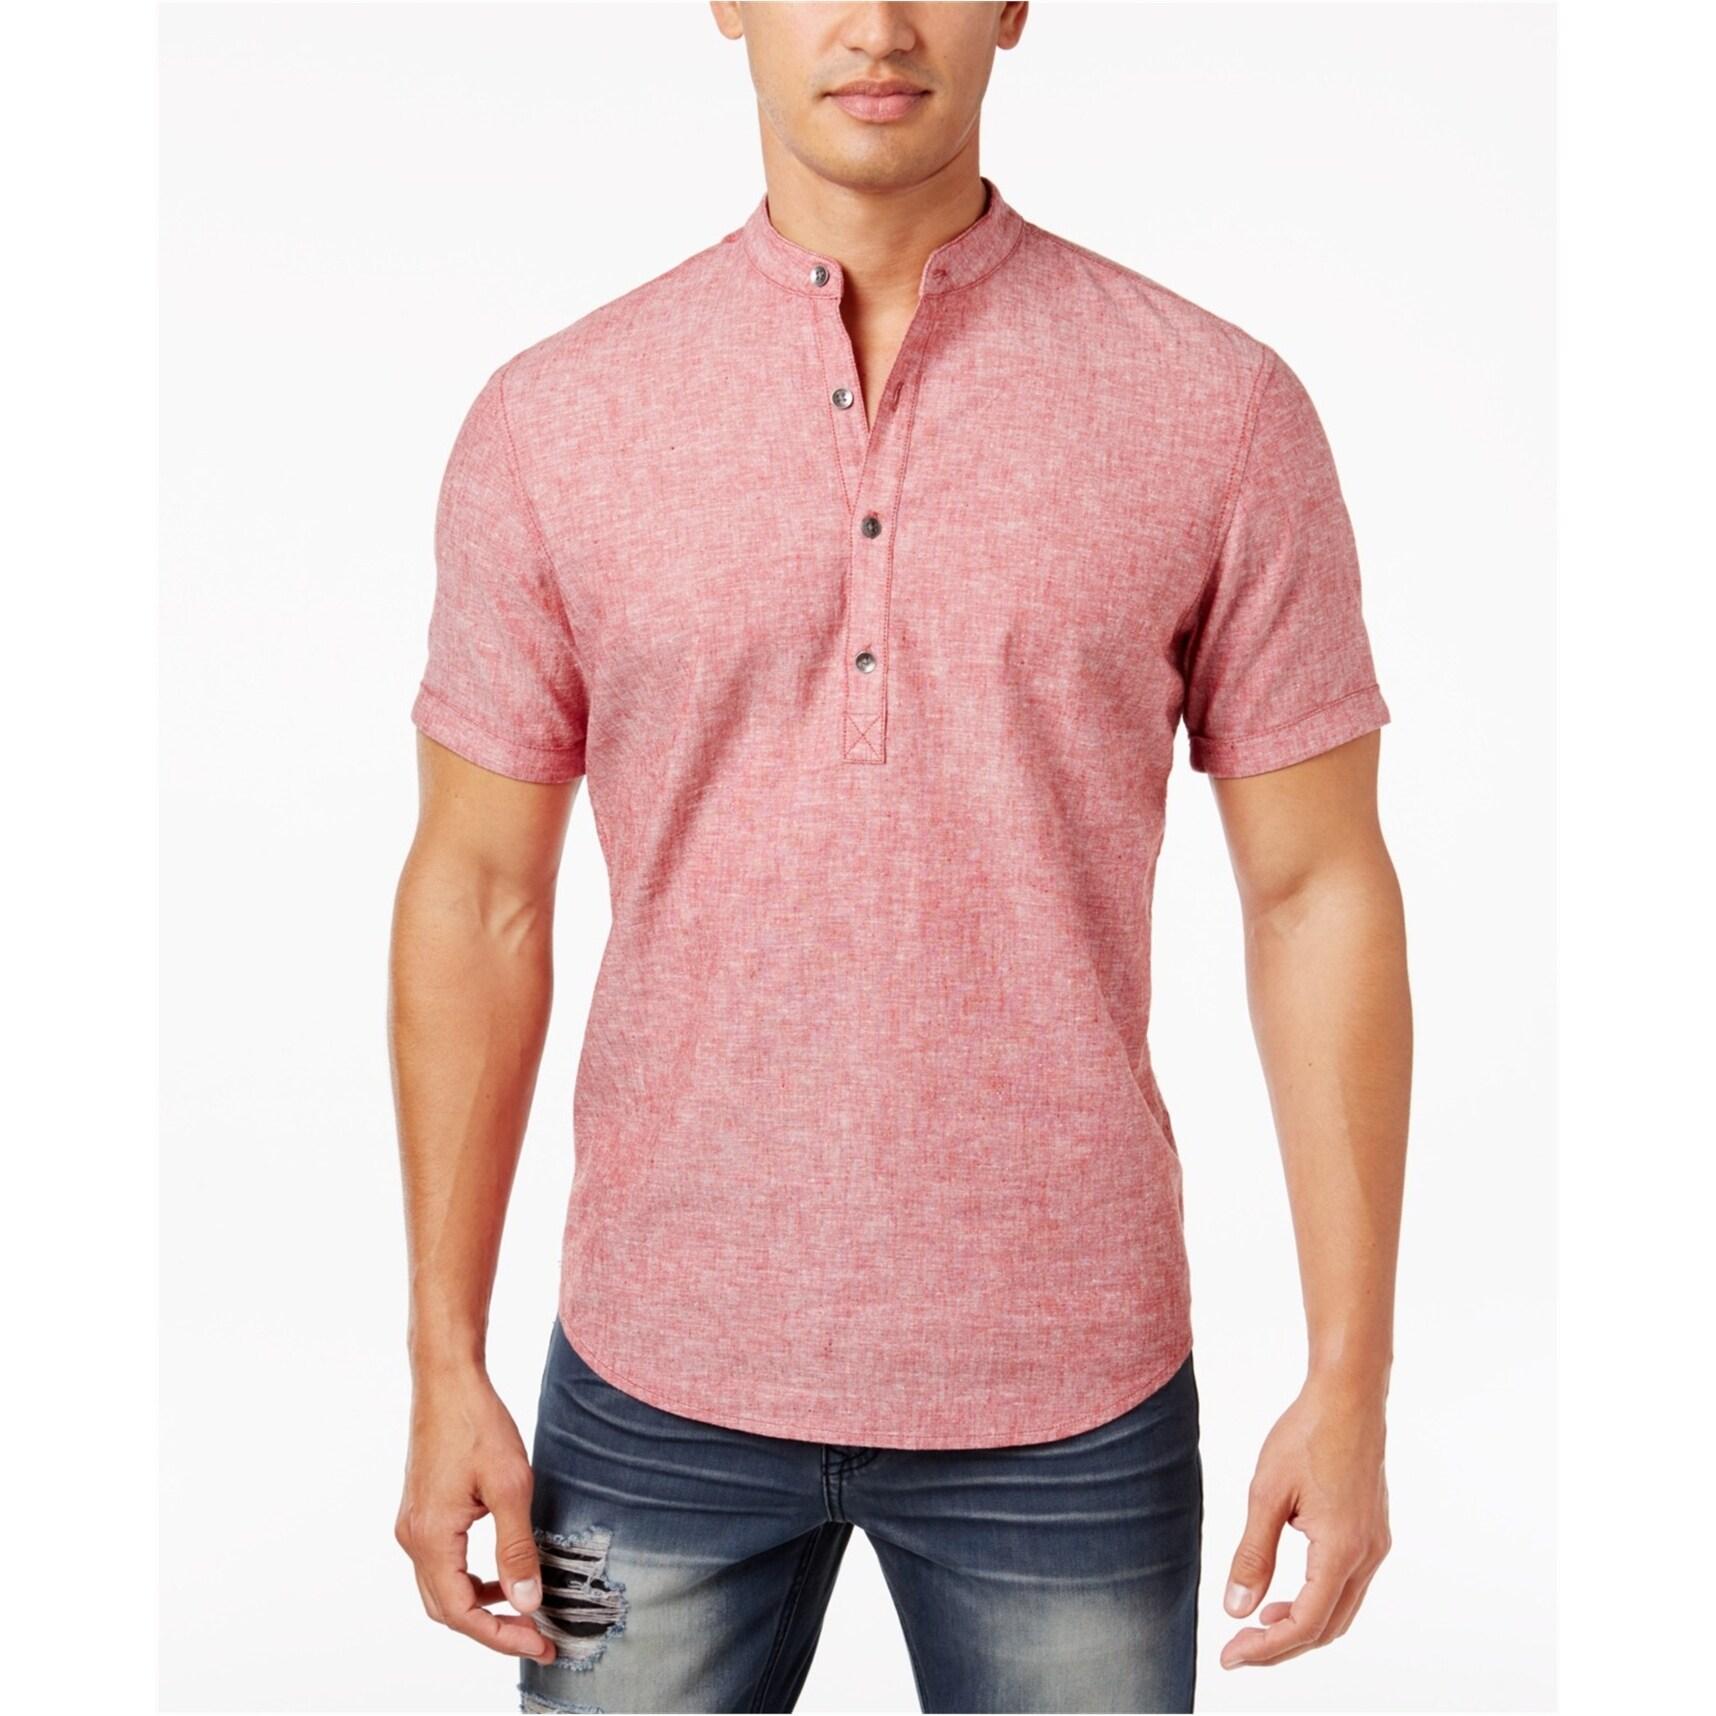 Nanquan Men Fleece V-Neck Long Sleeve Slim Warm Solid T-Shirt Henley Shirts